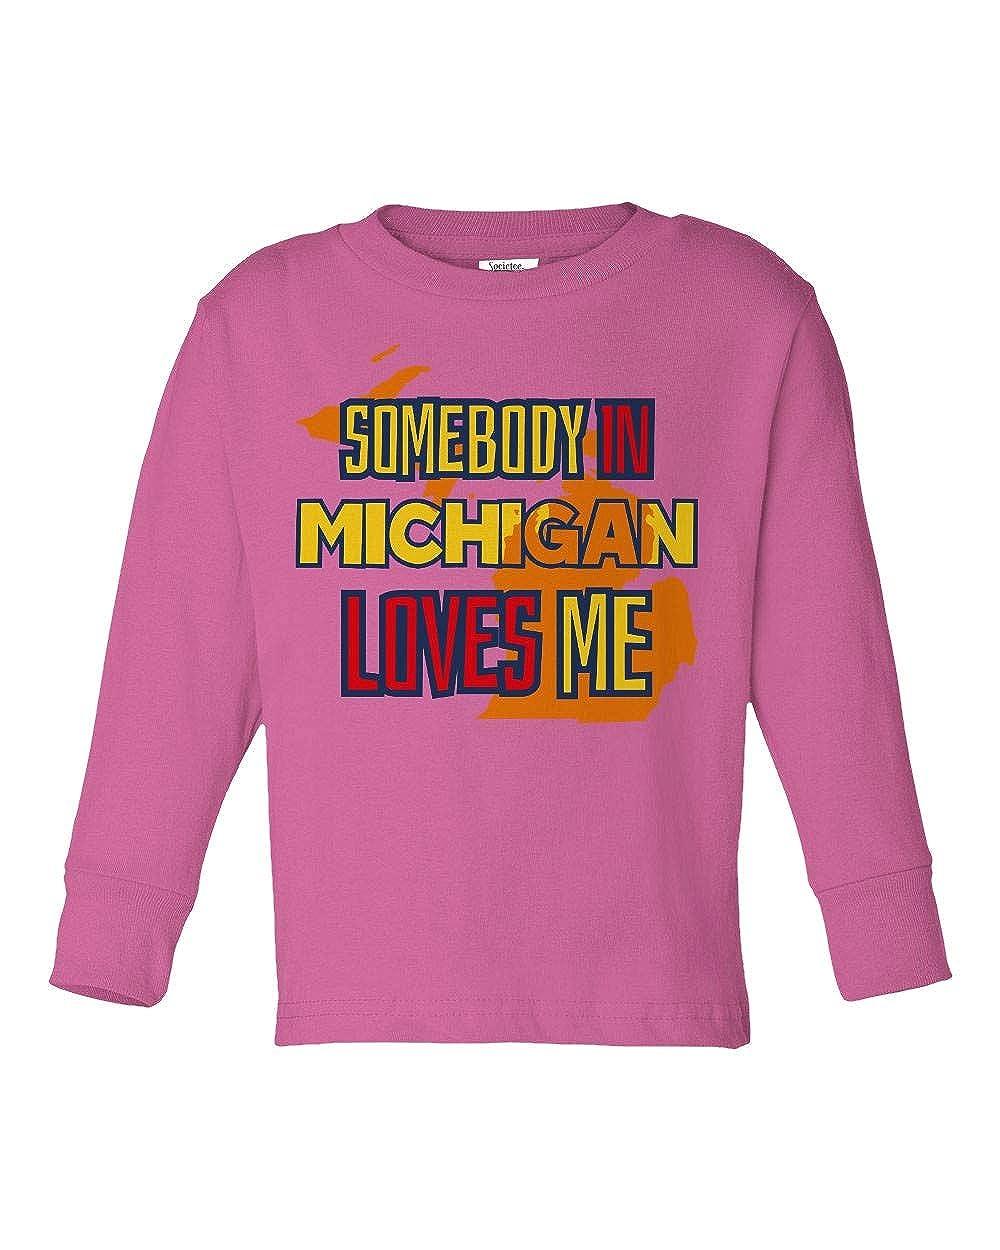 Societee Somebody in Michigan Loves Me Girls Boys Toddler Long Sleeve T-Shirt